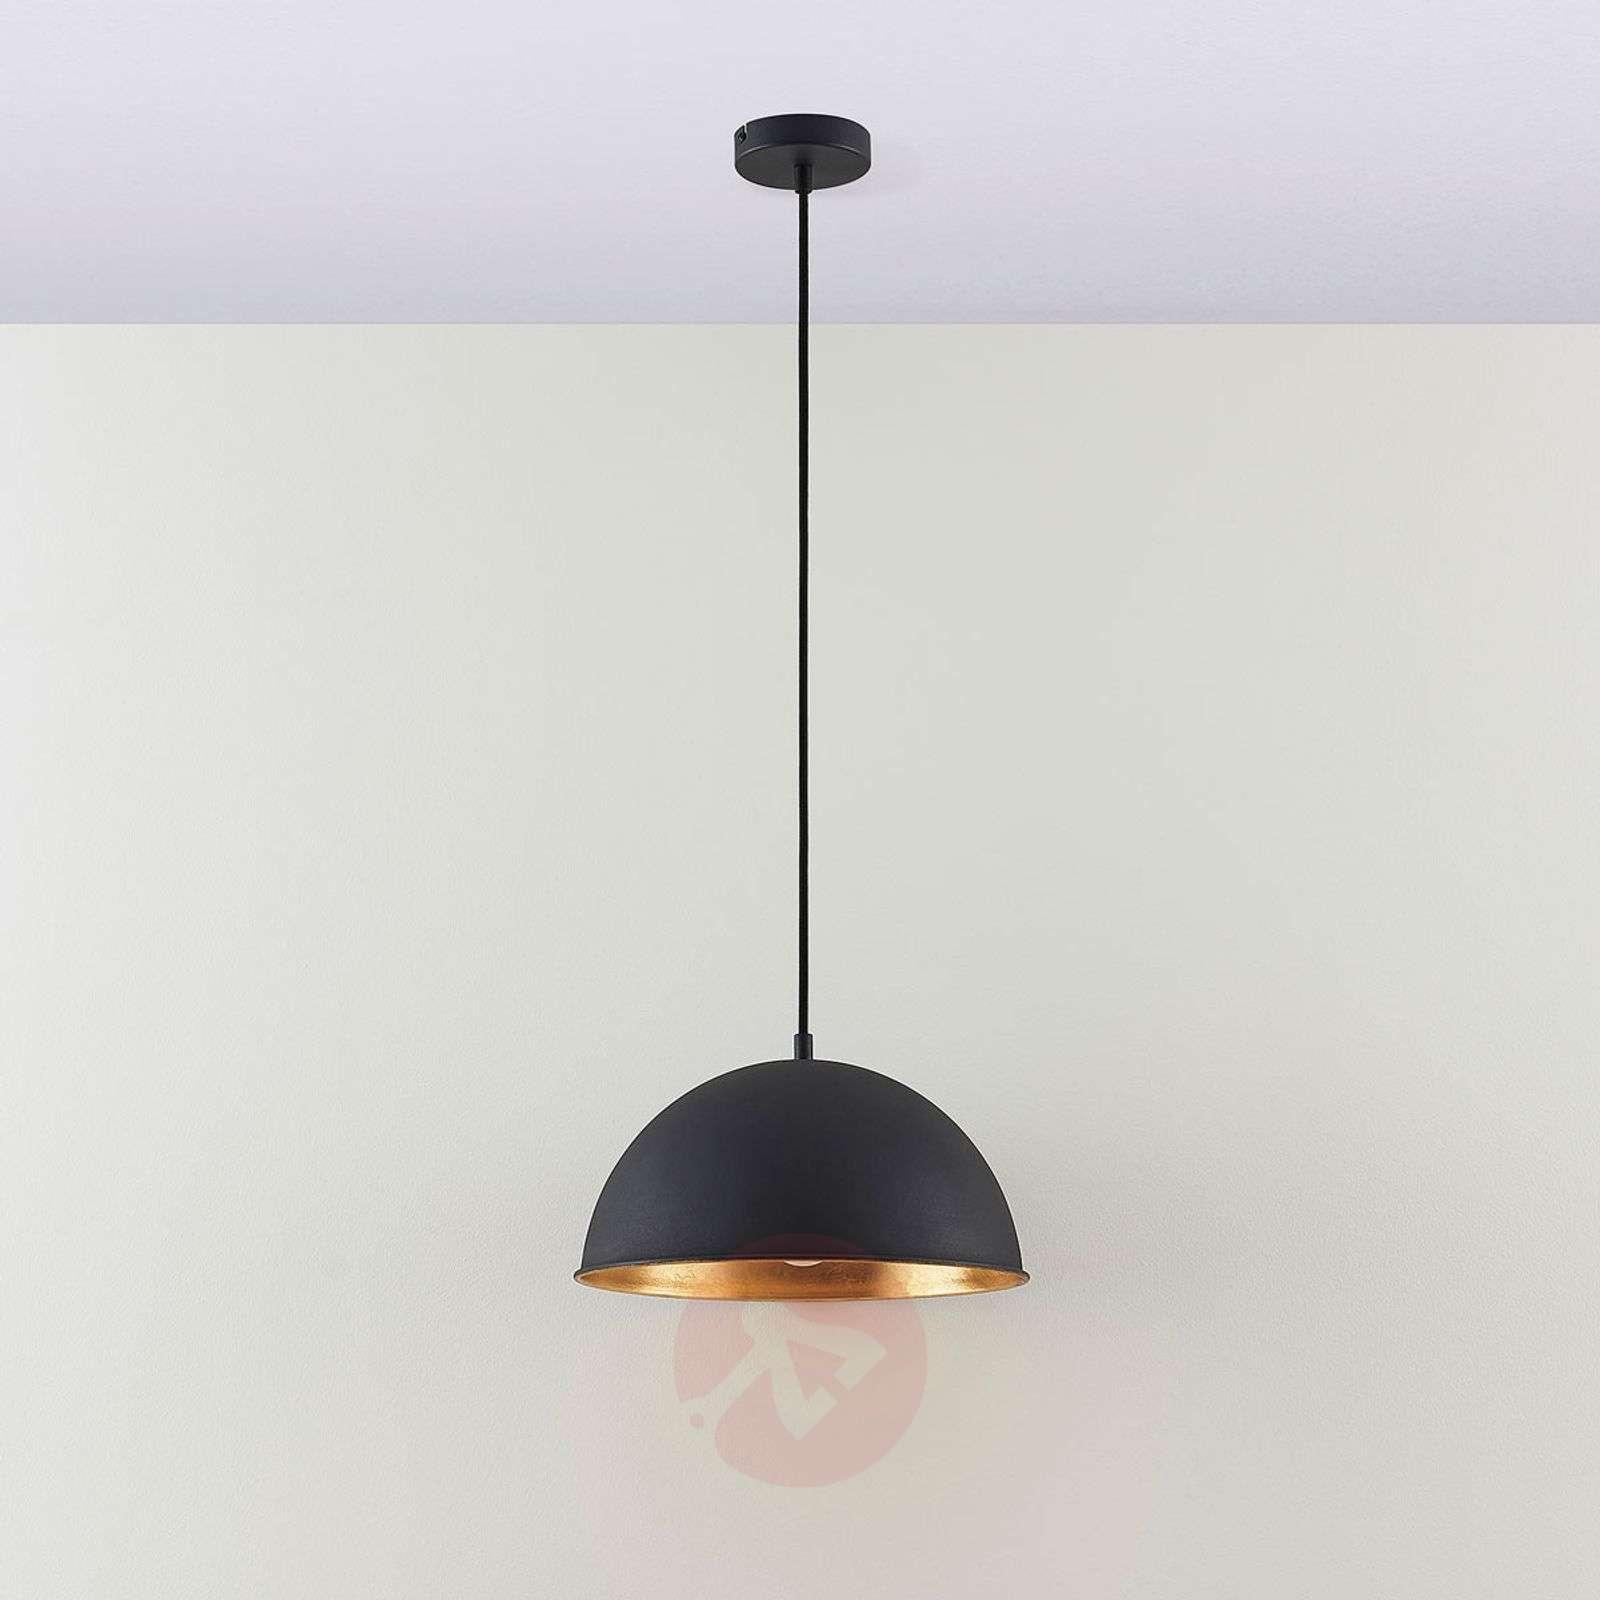 Black-gold pendant light Leya-9621366-02